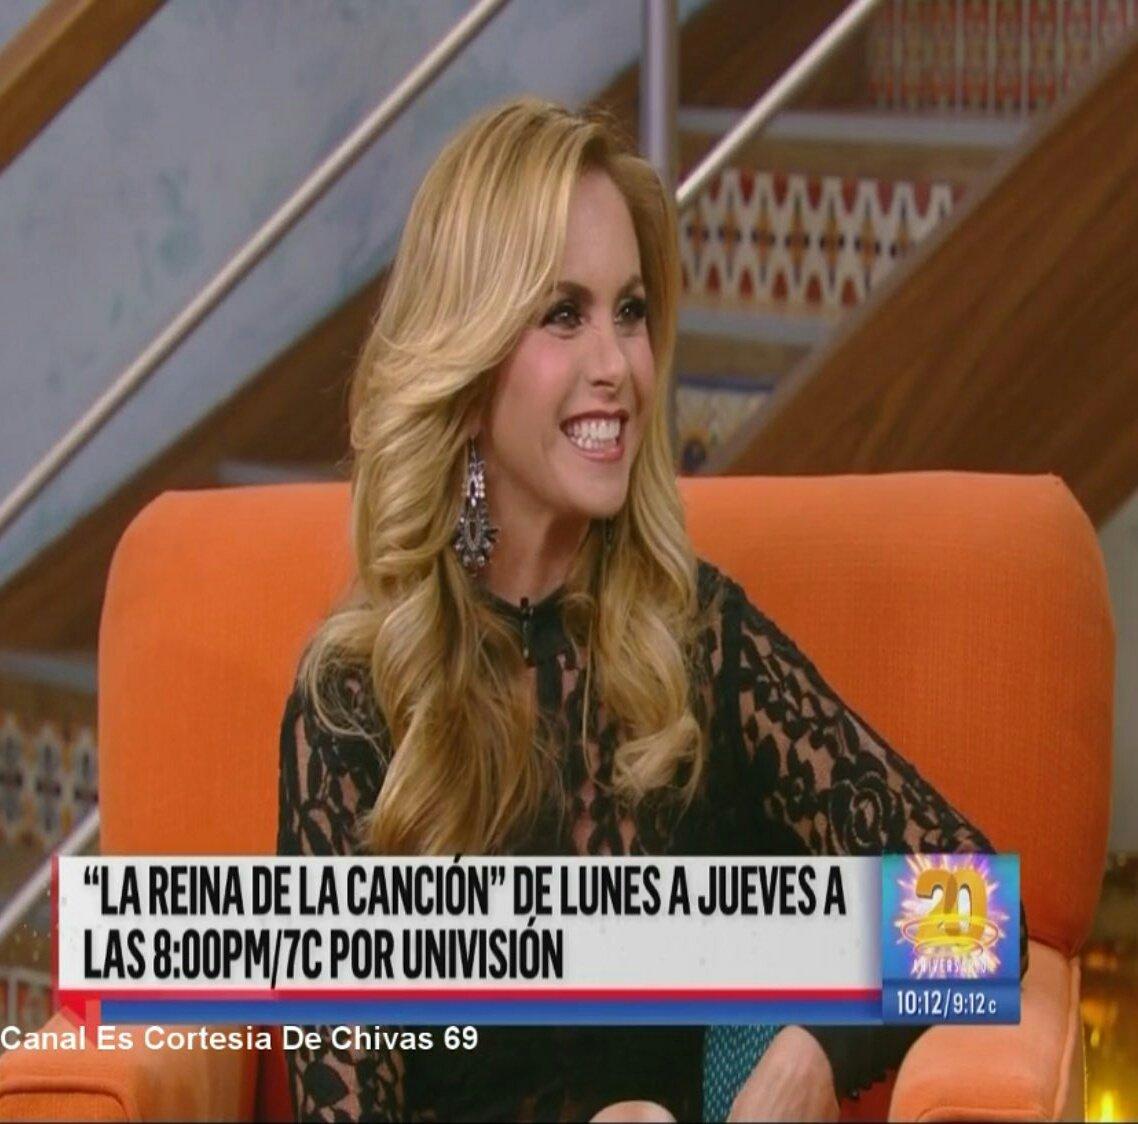 test Twitter Media - É tão divina!! @LuceroMexico  #LuceroEnDA https://t.co/q5eKsKQb9E